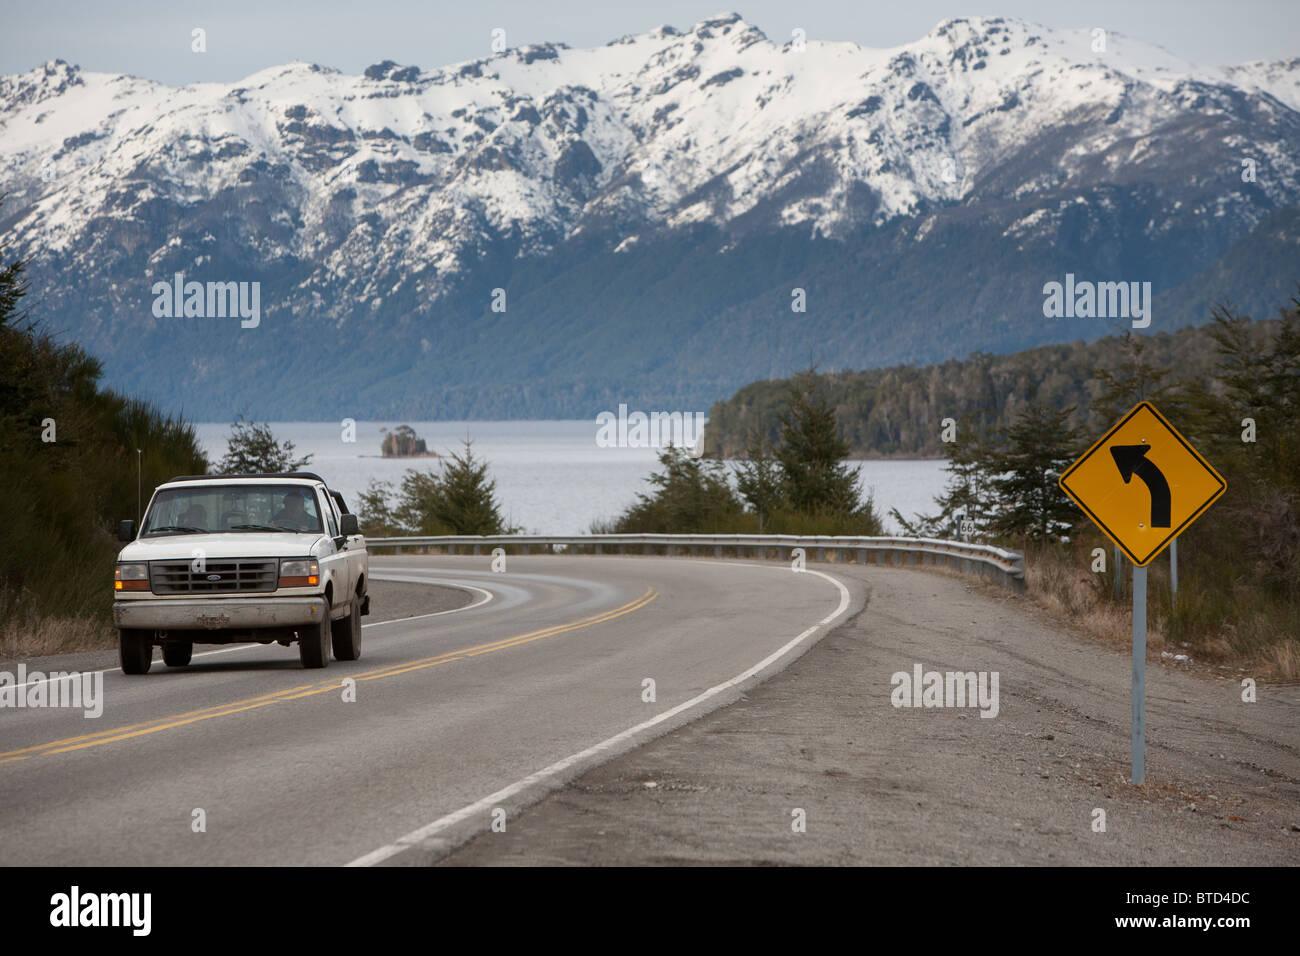 Road to Villa La Angostura with Lake Nahuel Huapi and snowed Andes mountains at the back - Stock Image